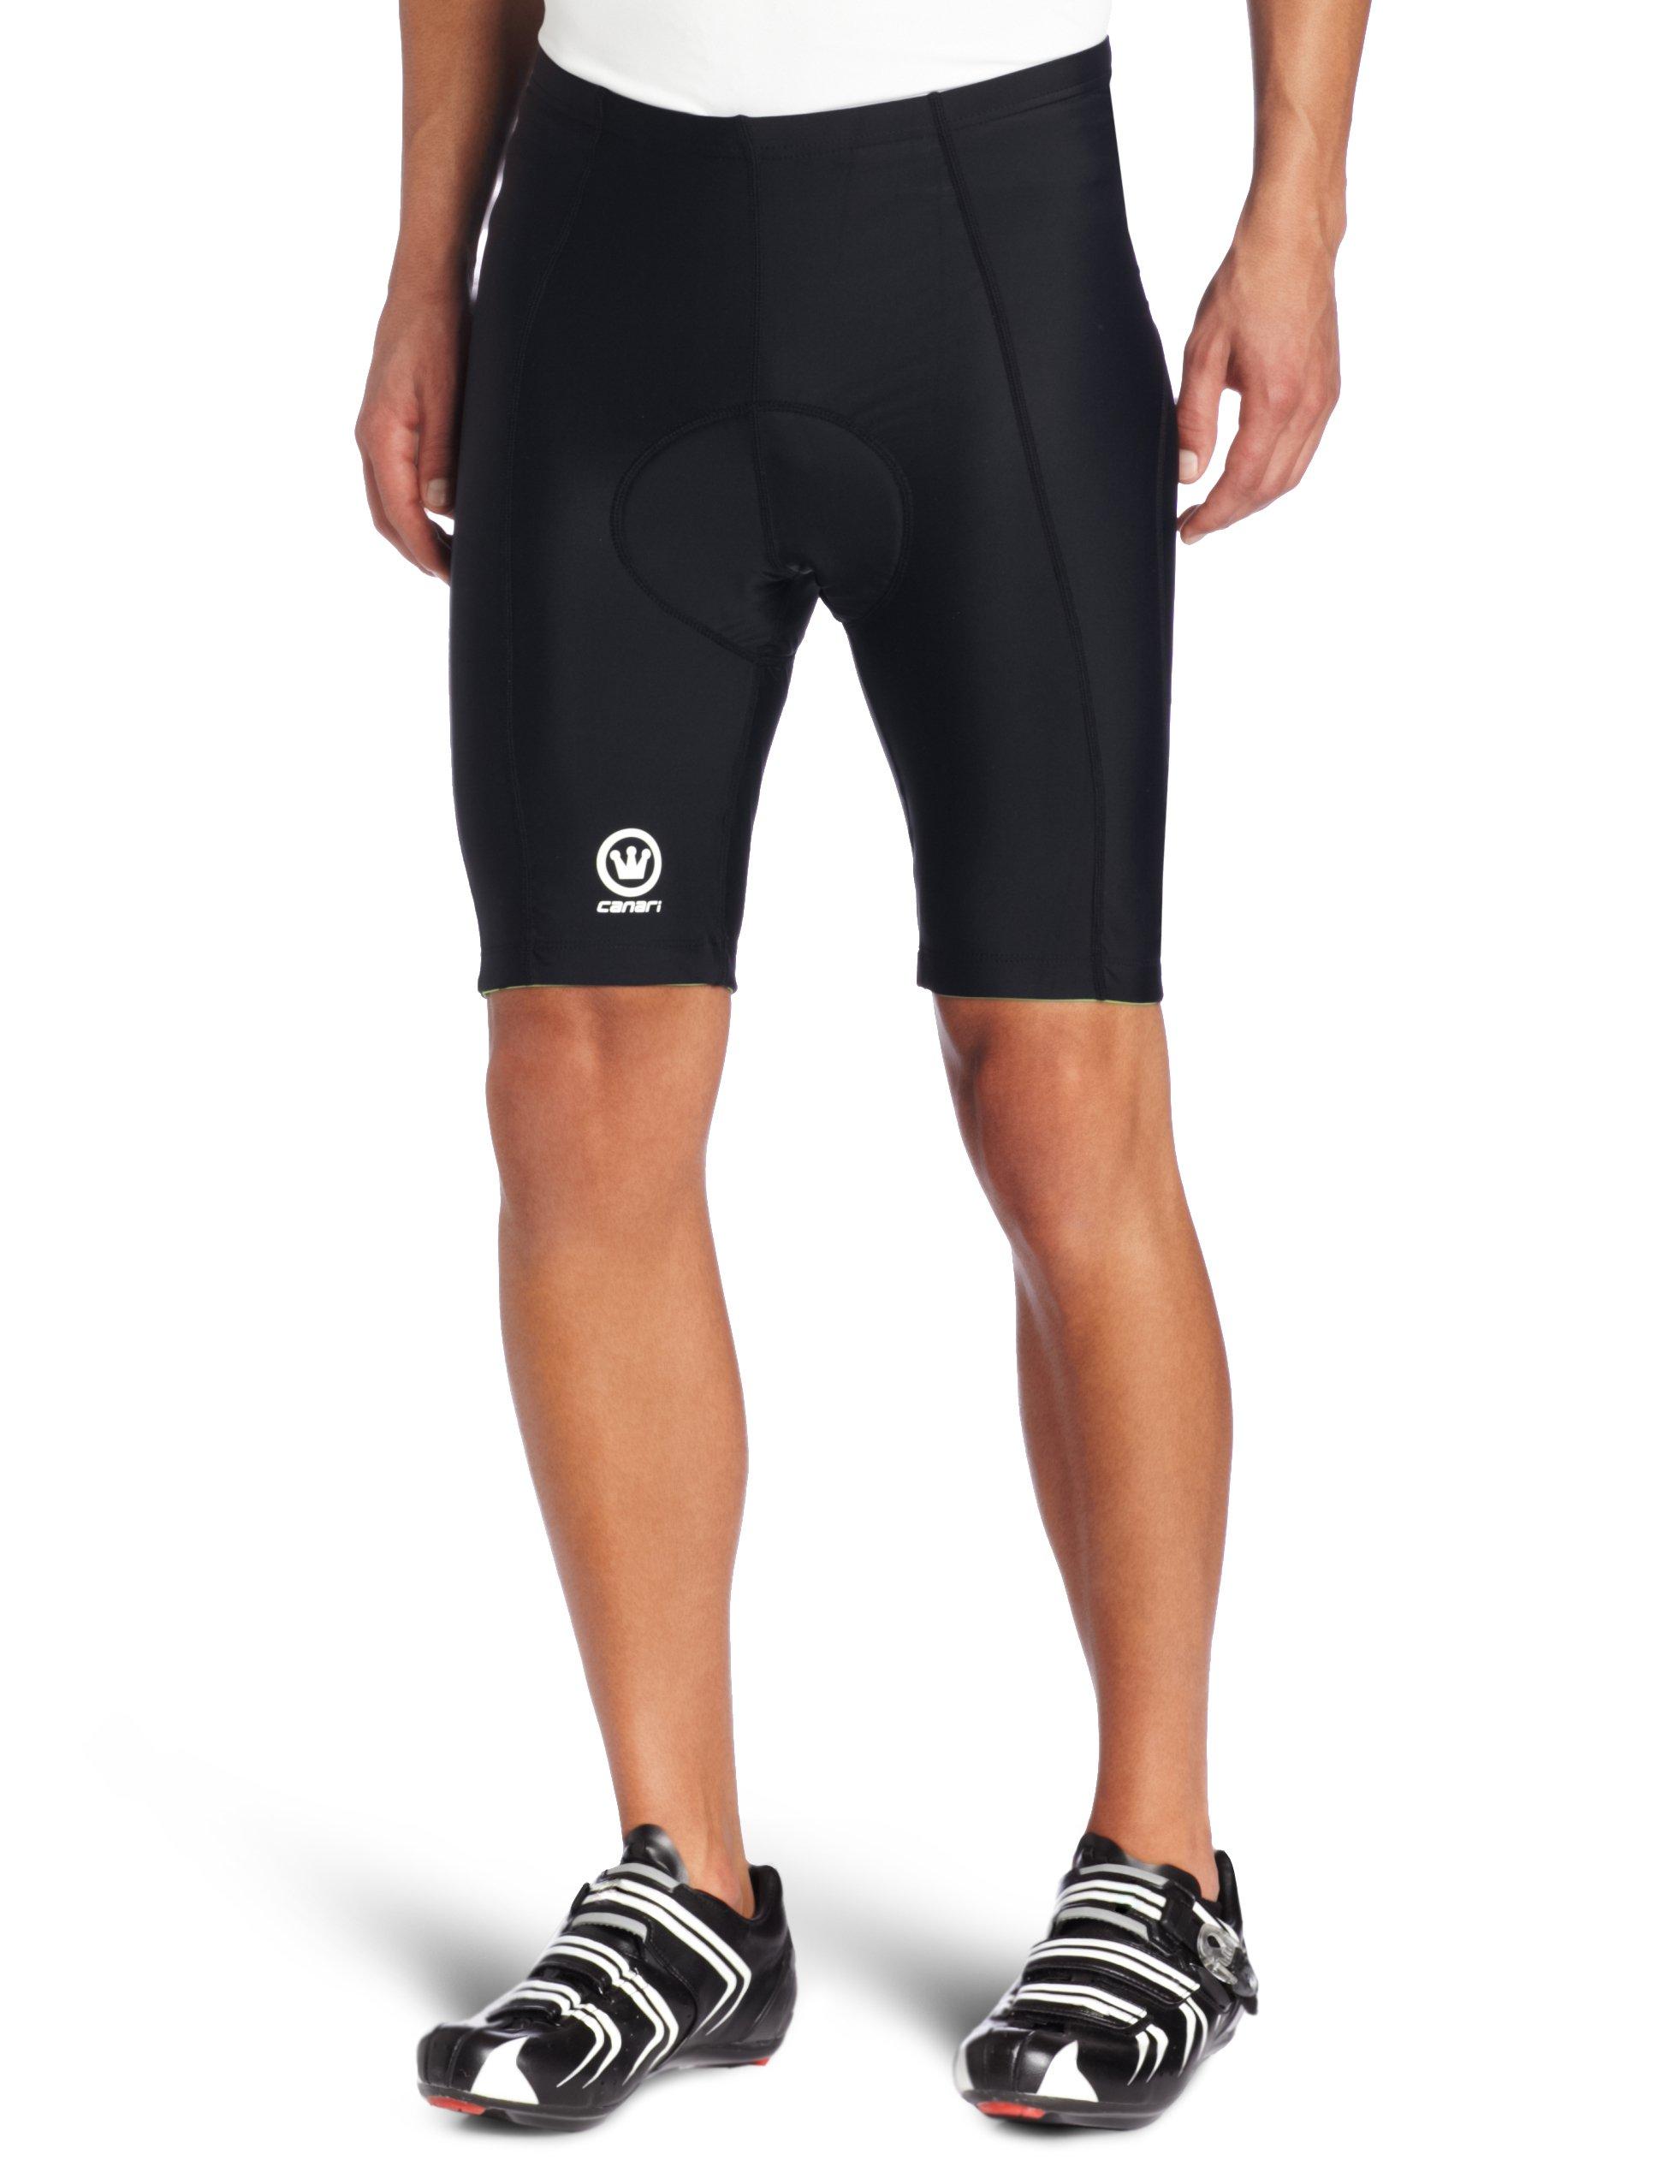 Canari Velo Gel Cycling Short Mens (Black) X-Large by Canari Cyclewear (Image #1)